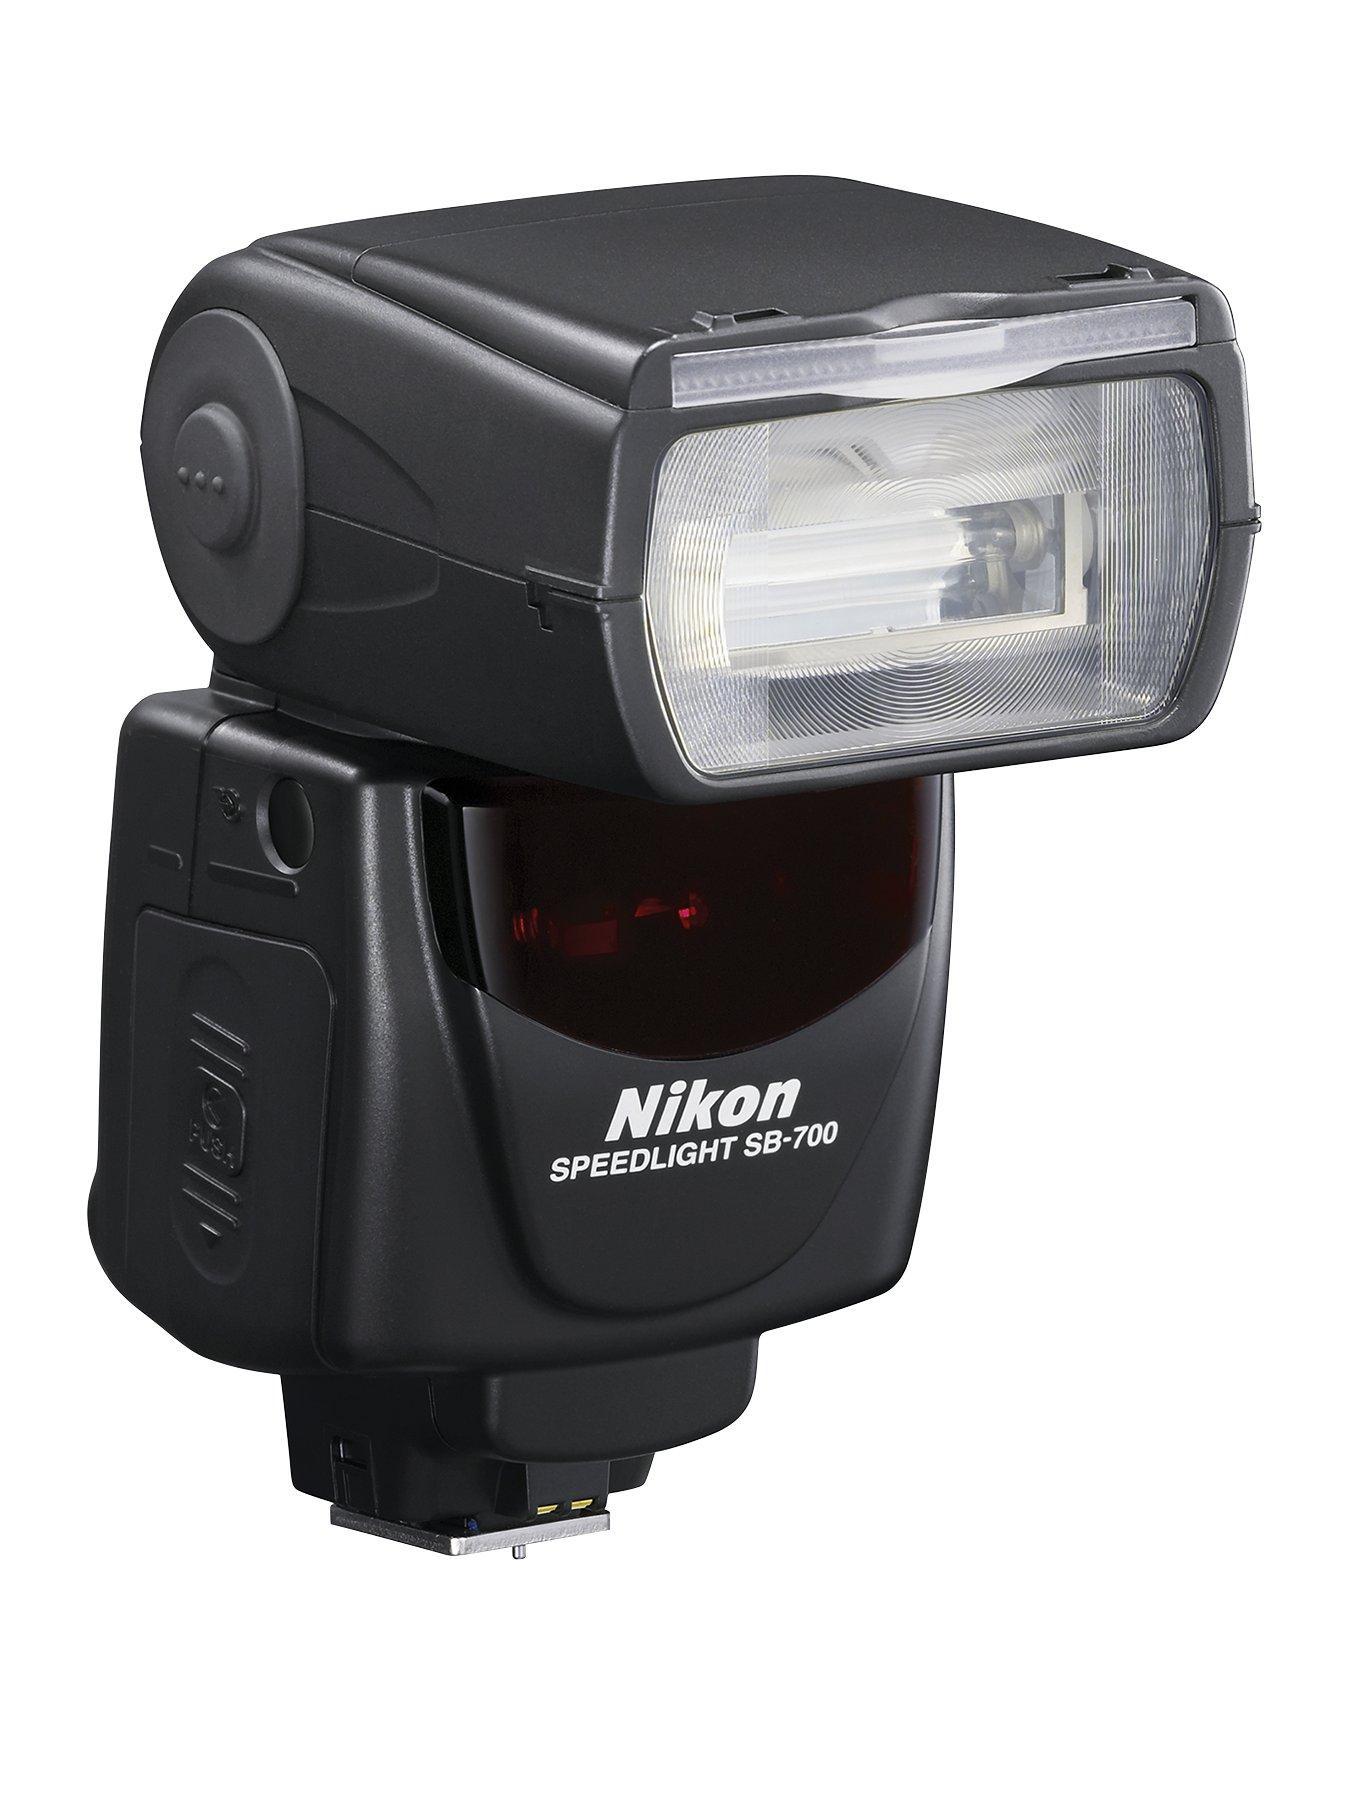 i-TTL Compact Bounce /& Swivel Flash for Nikon P7700